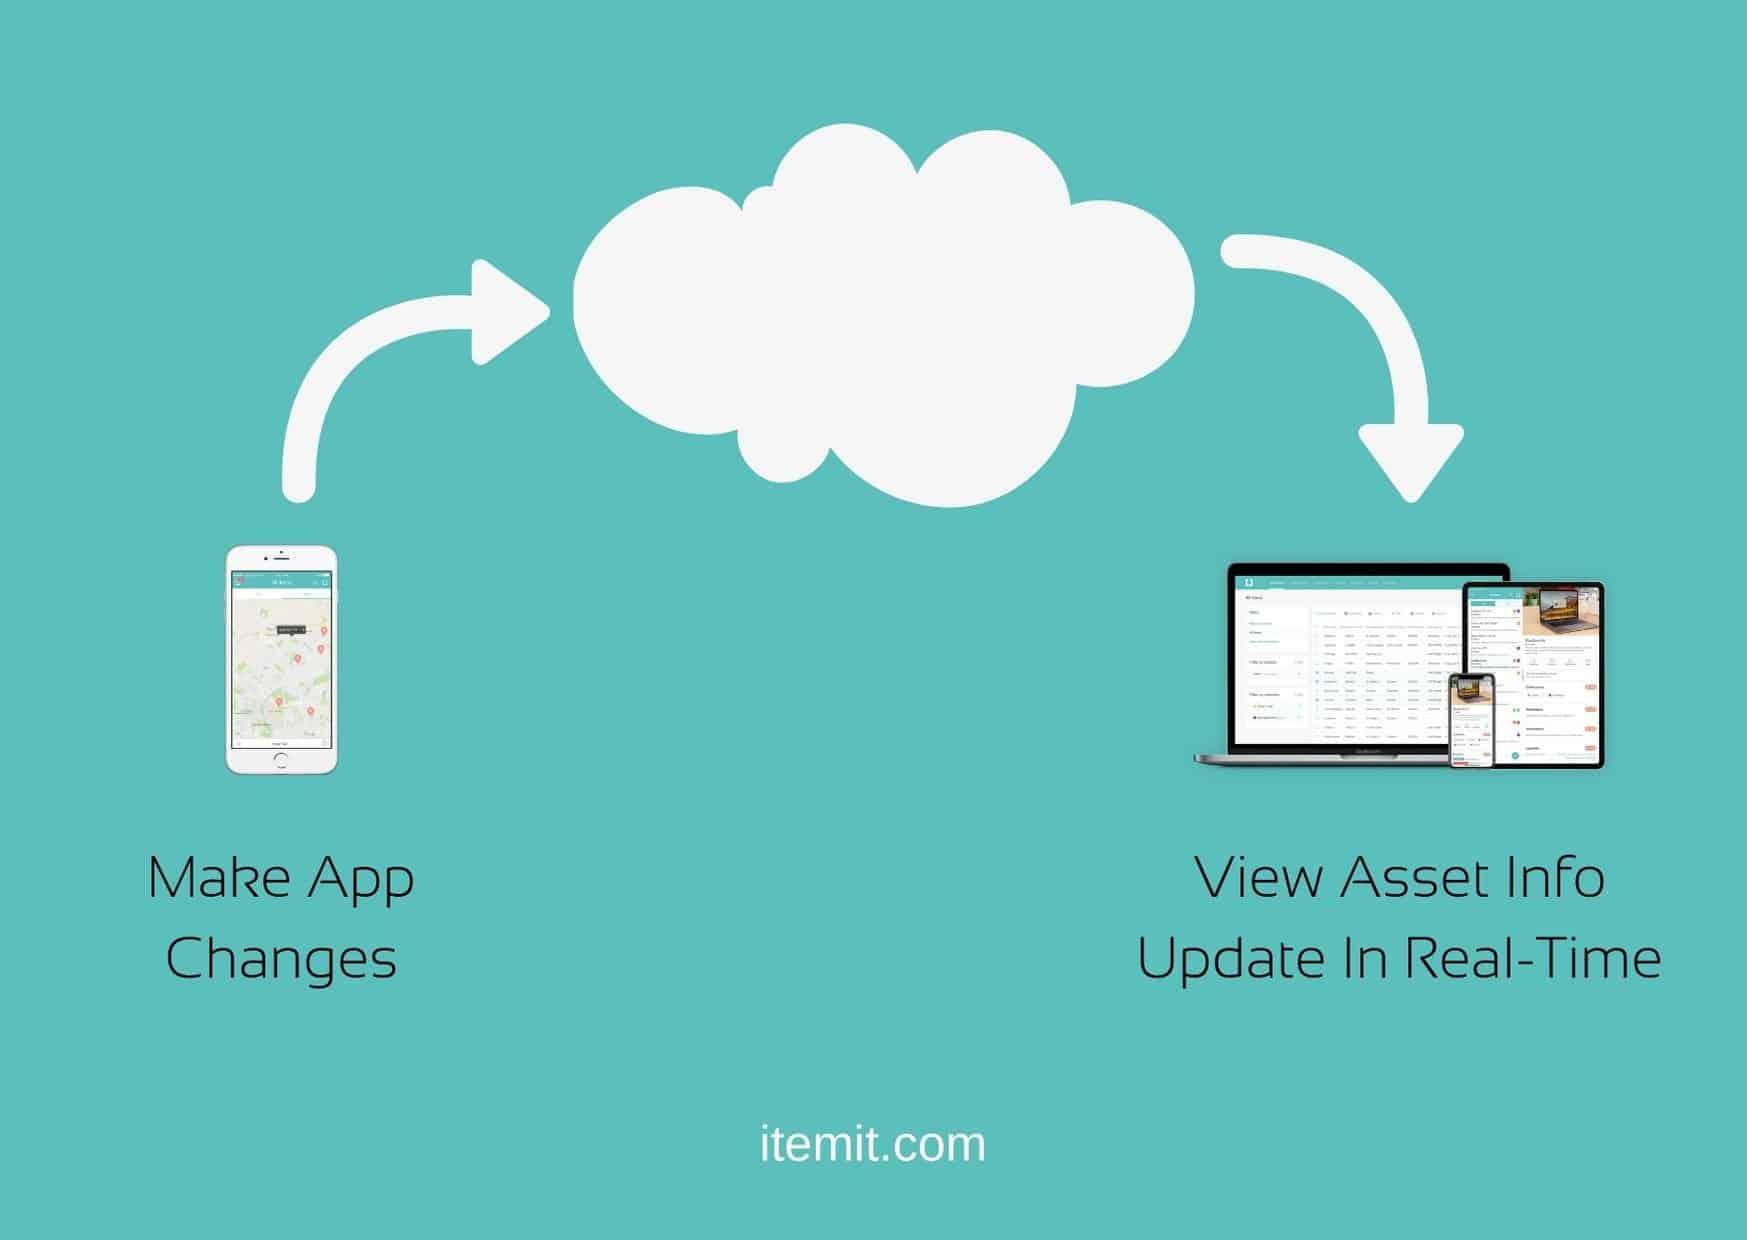 itemit_ cloud-based asset management system